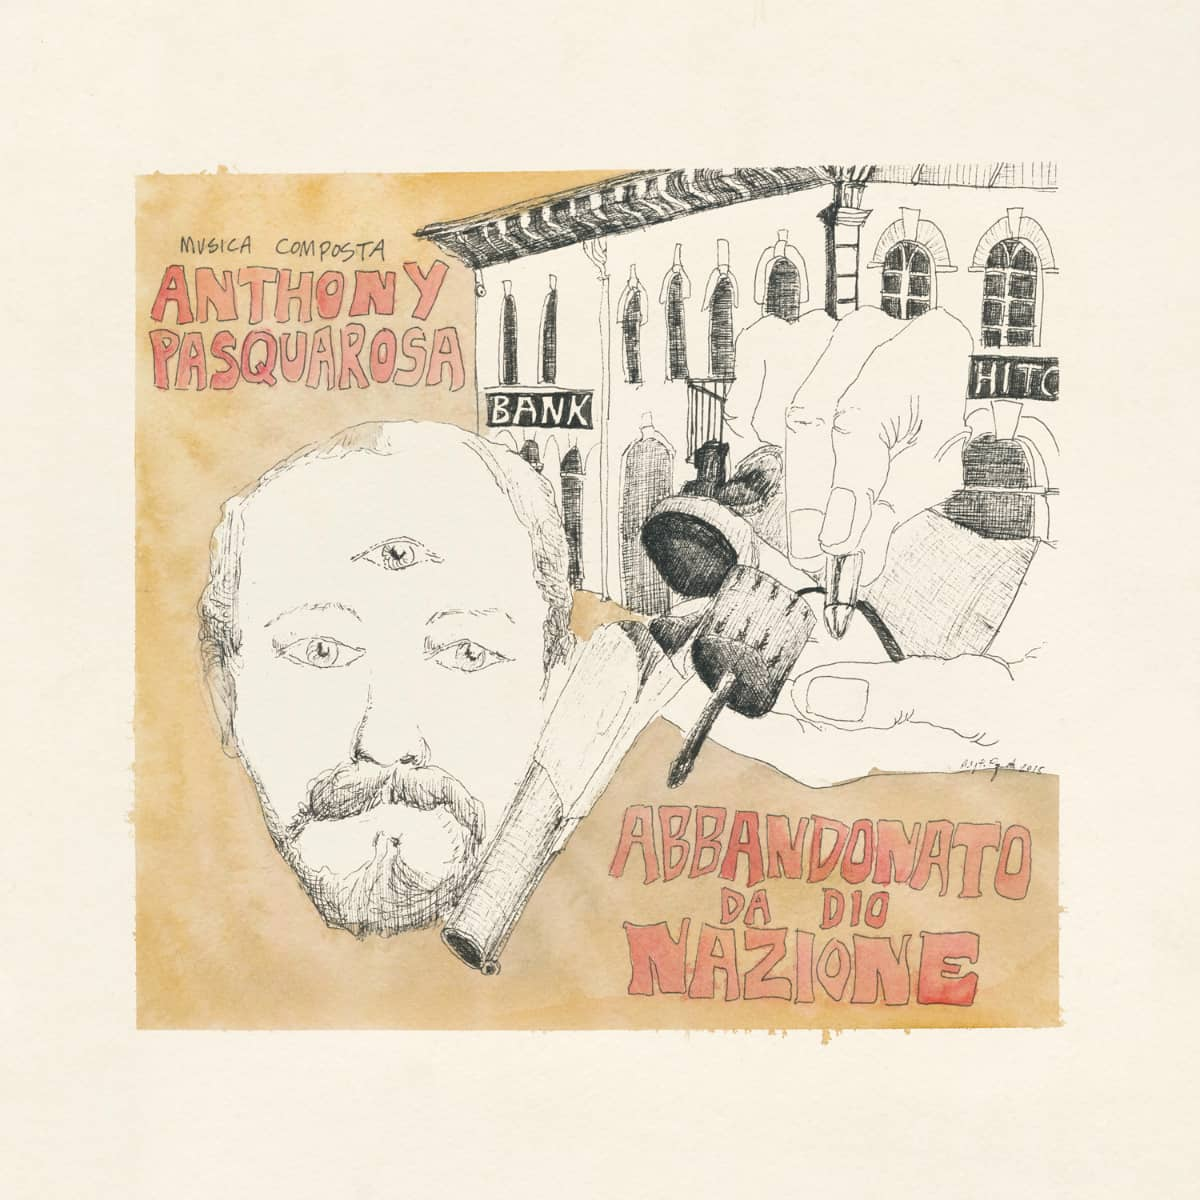 Anthony Pasquarosa, spaghetti western music